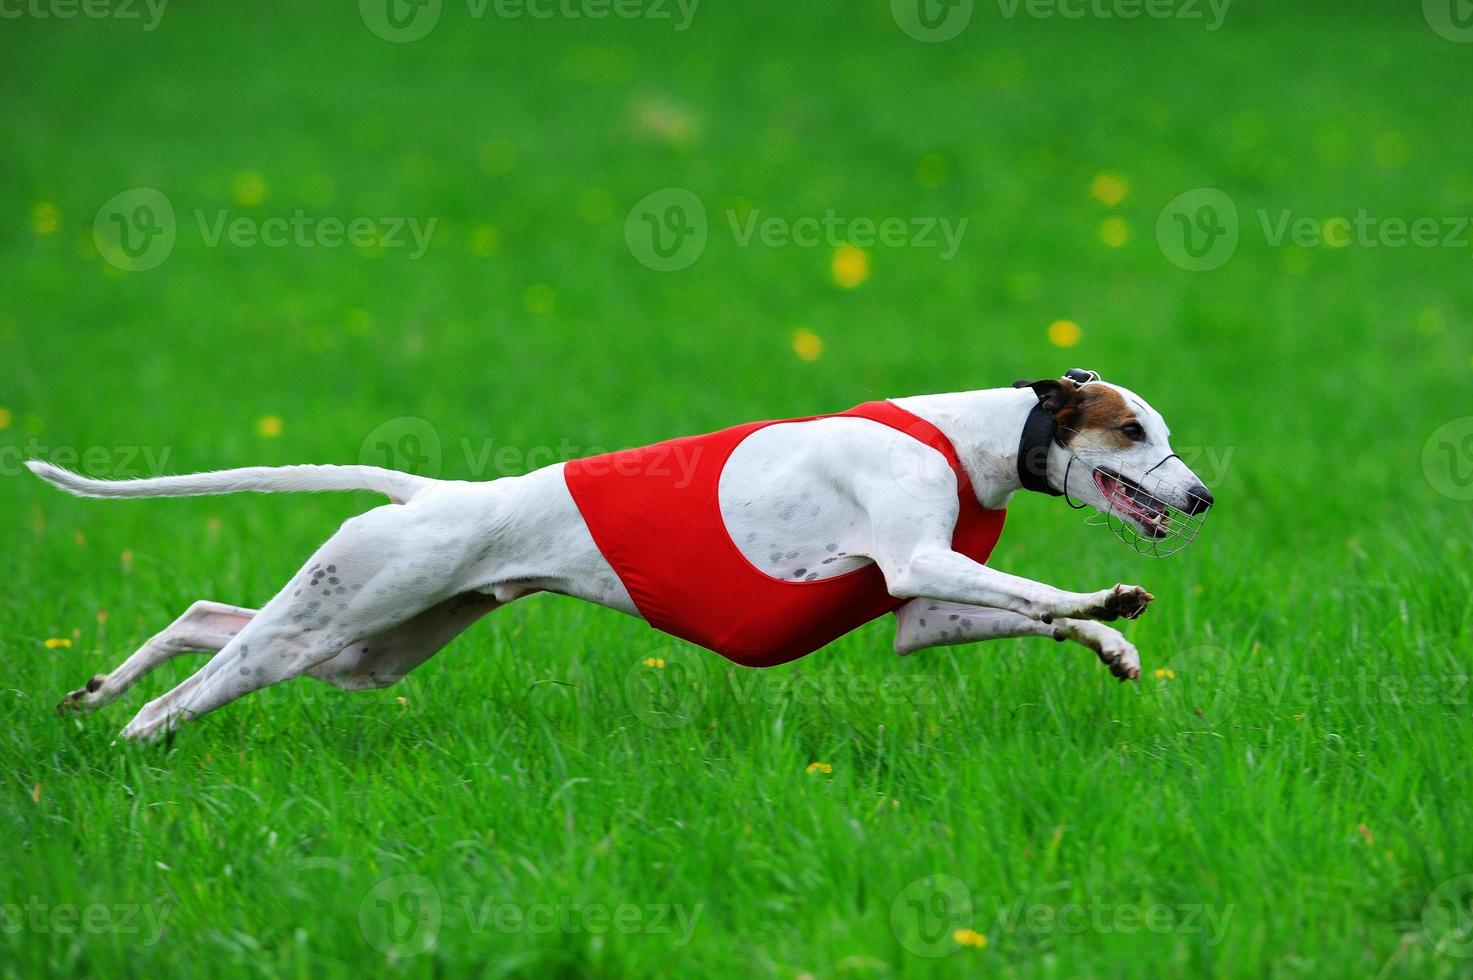 Coursing Greyhound photo